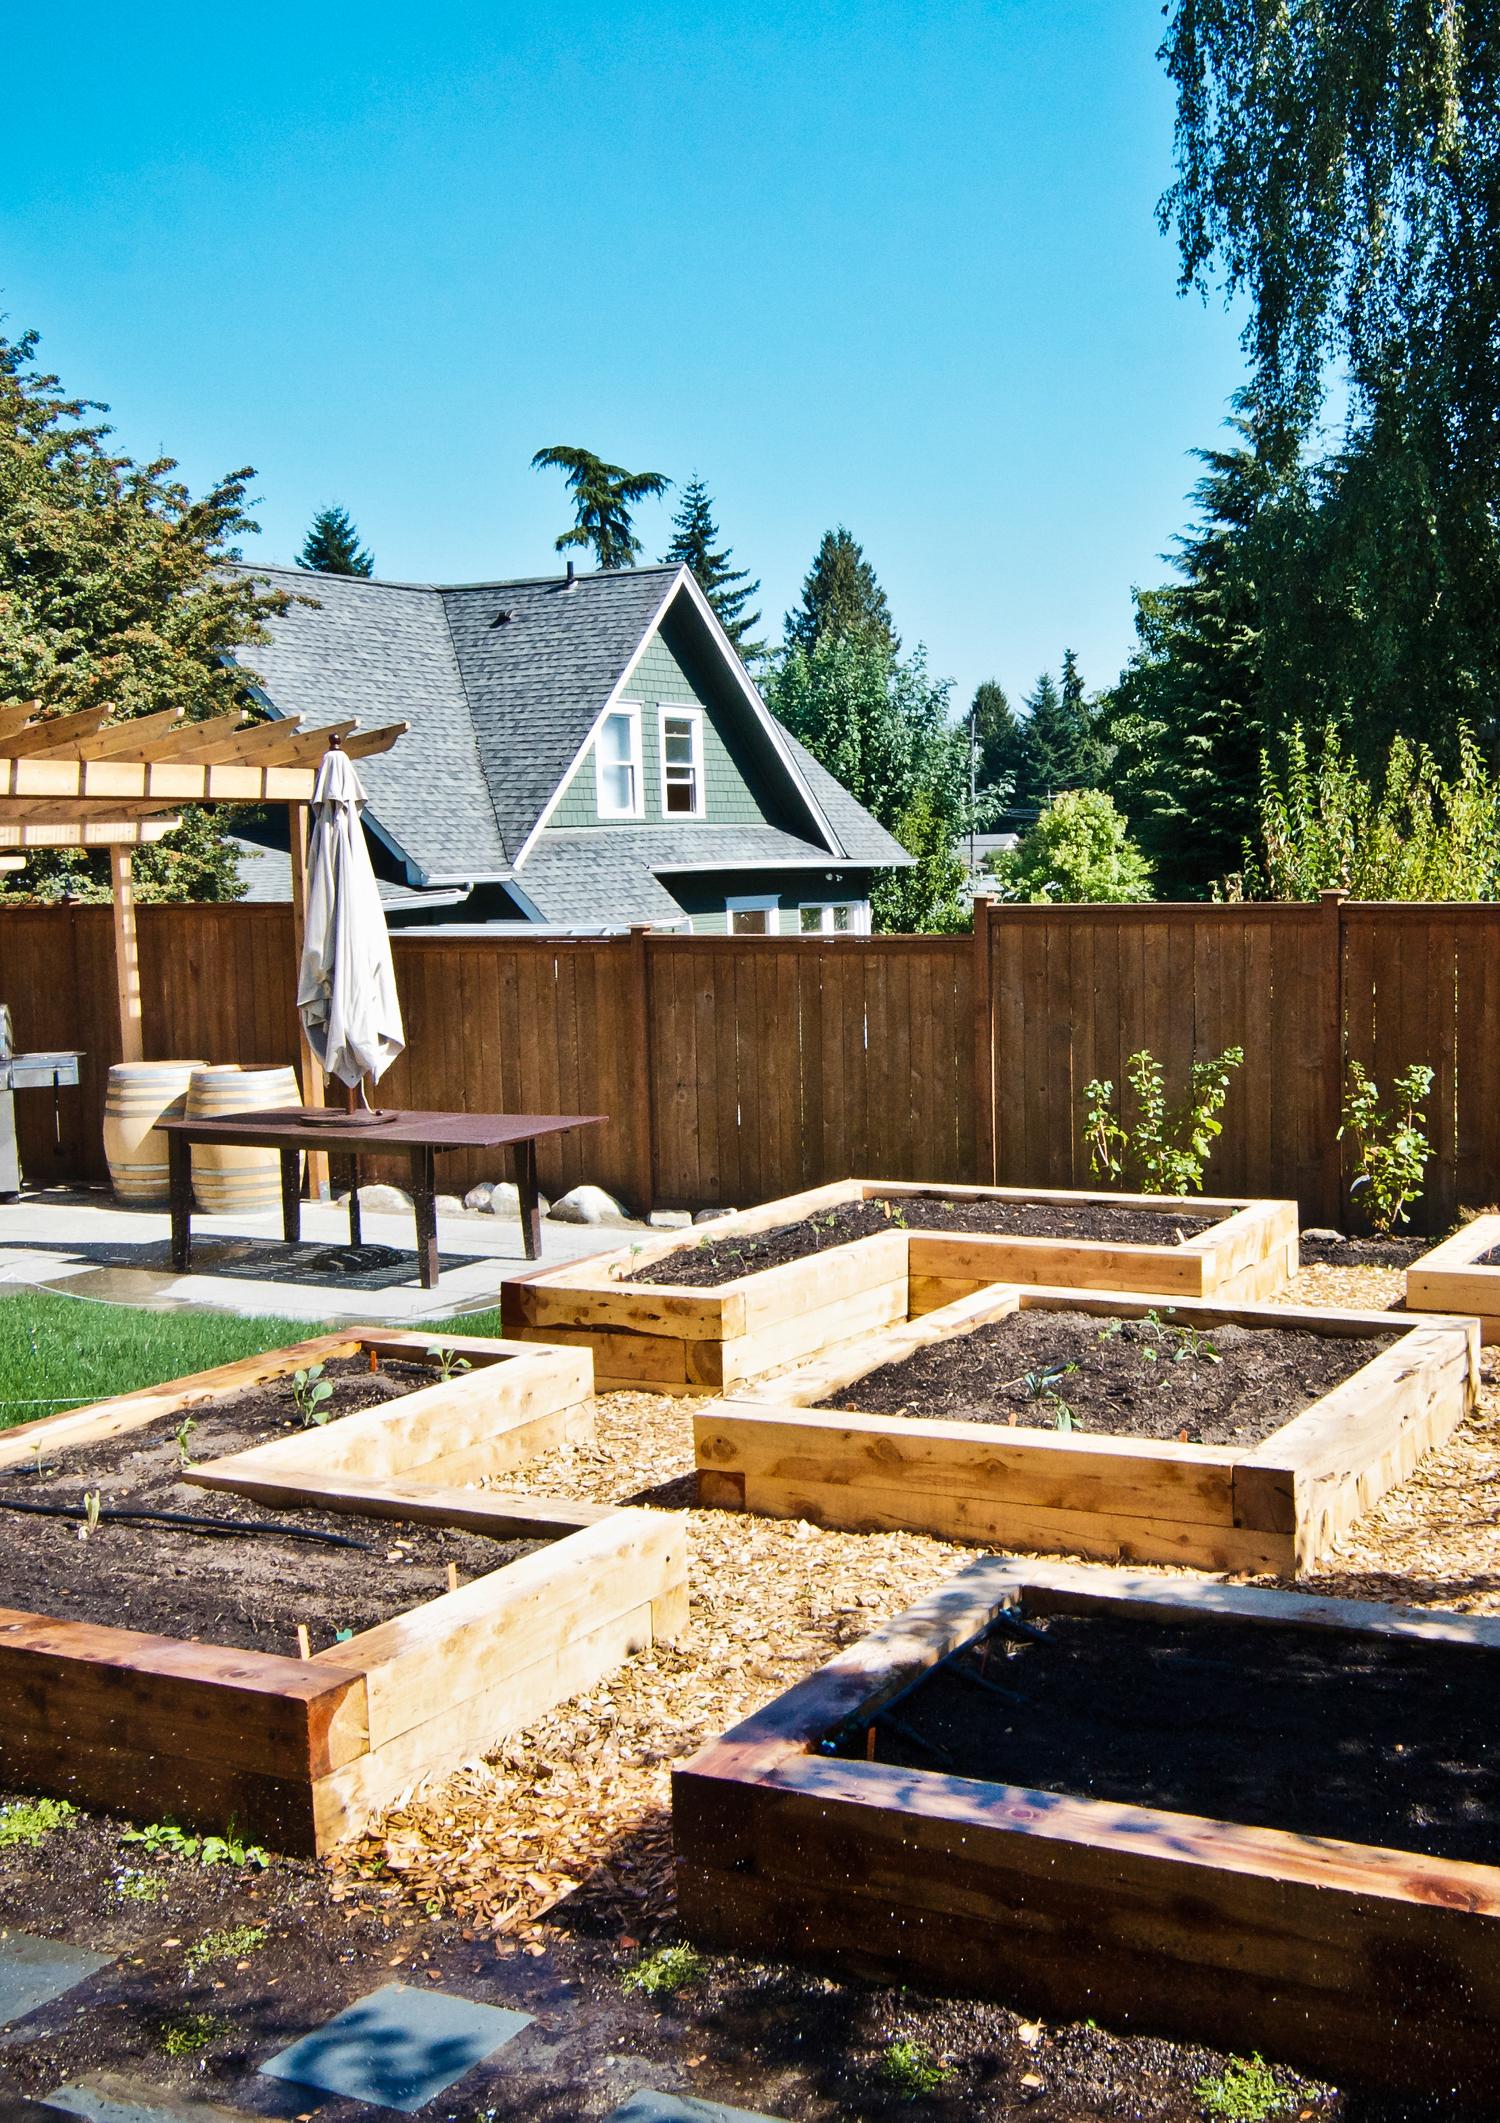 South Seattle Edible Landscape_Seattle Urban Farm Company_Raised Beds.jpg